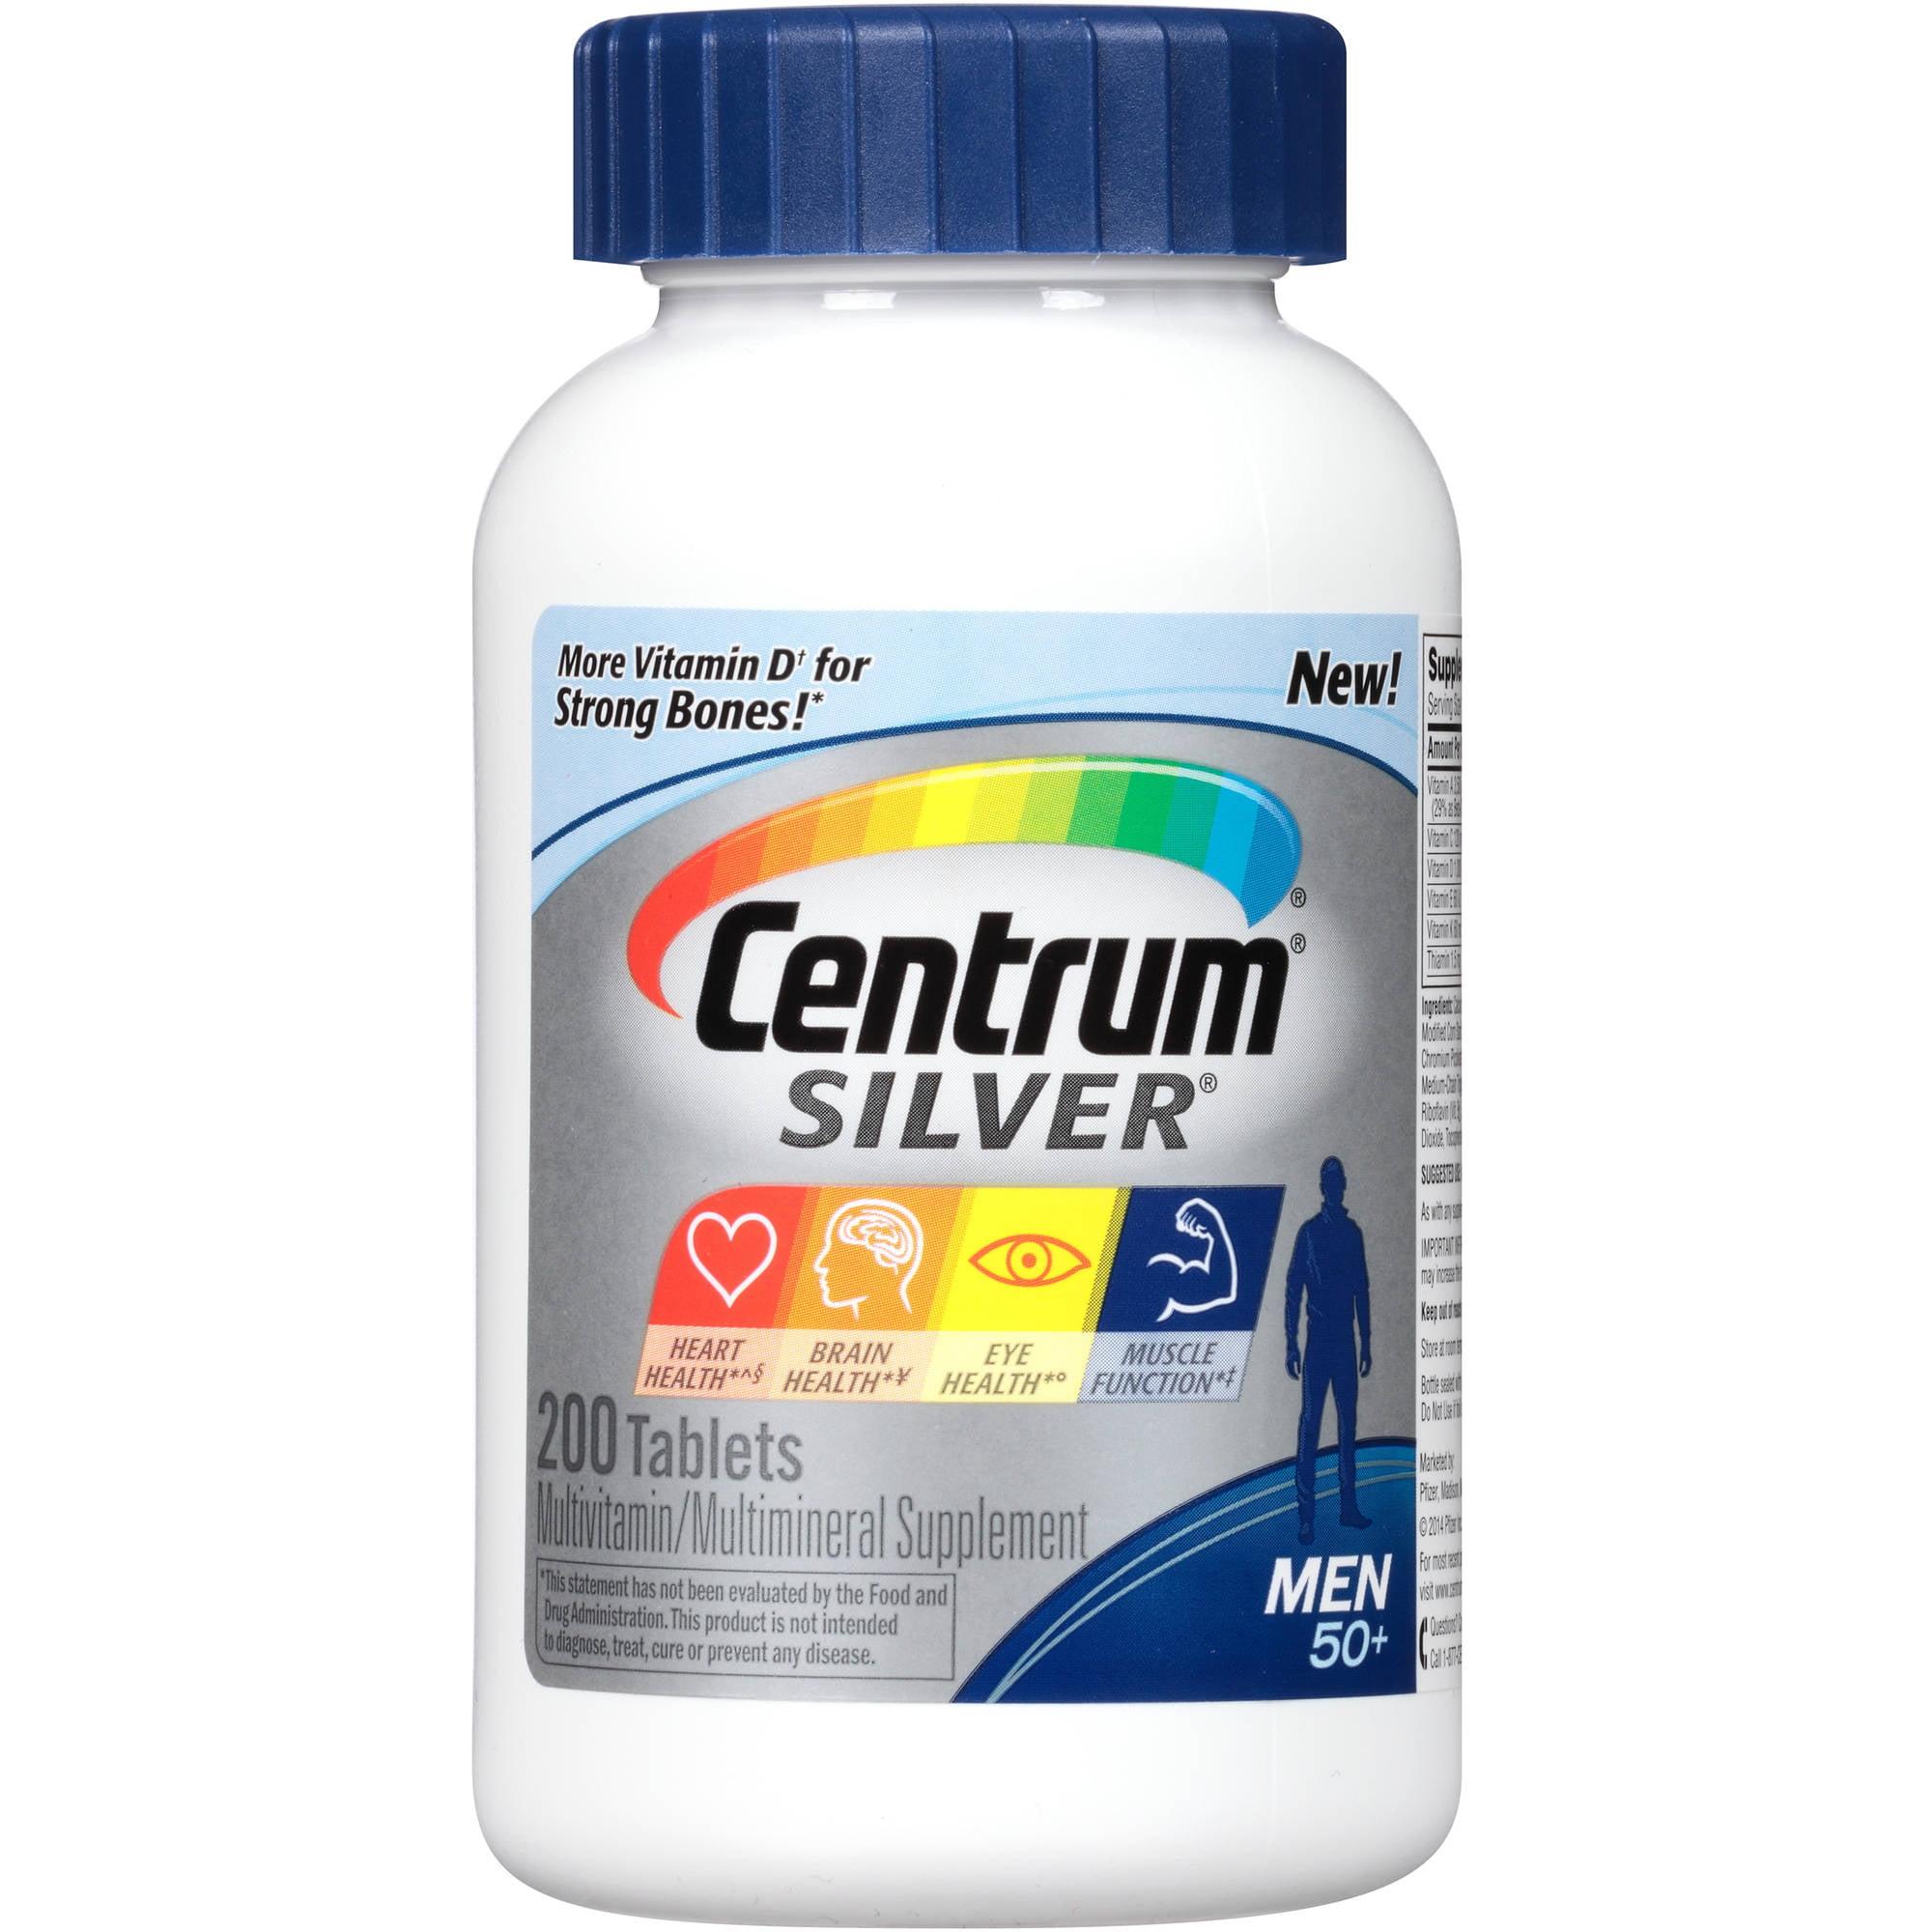 Centrum Silver Men Multivitamin/Multimineral Supplement 200 Count